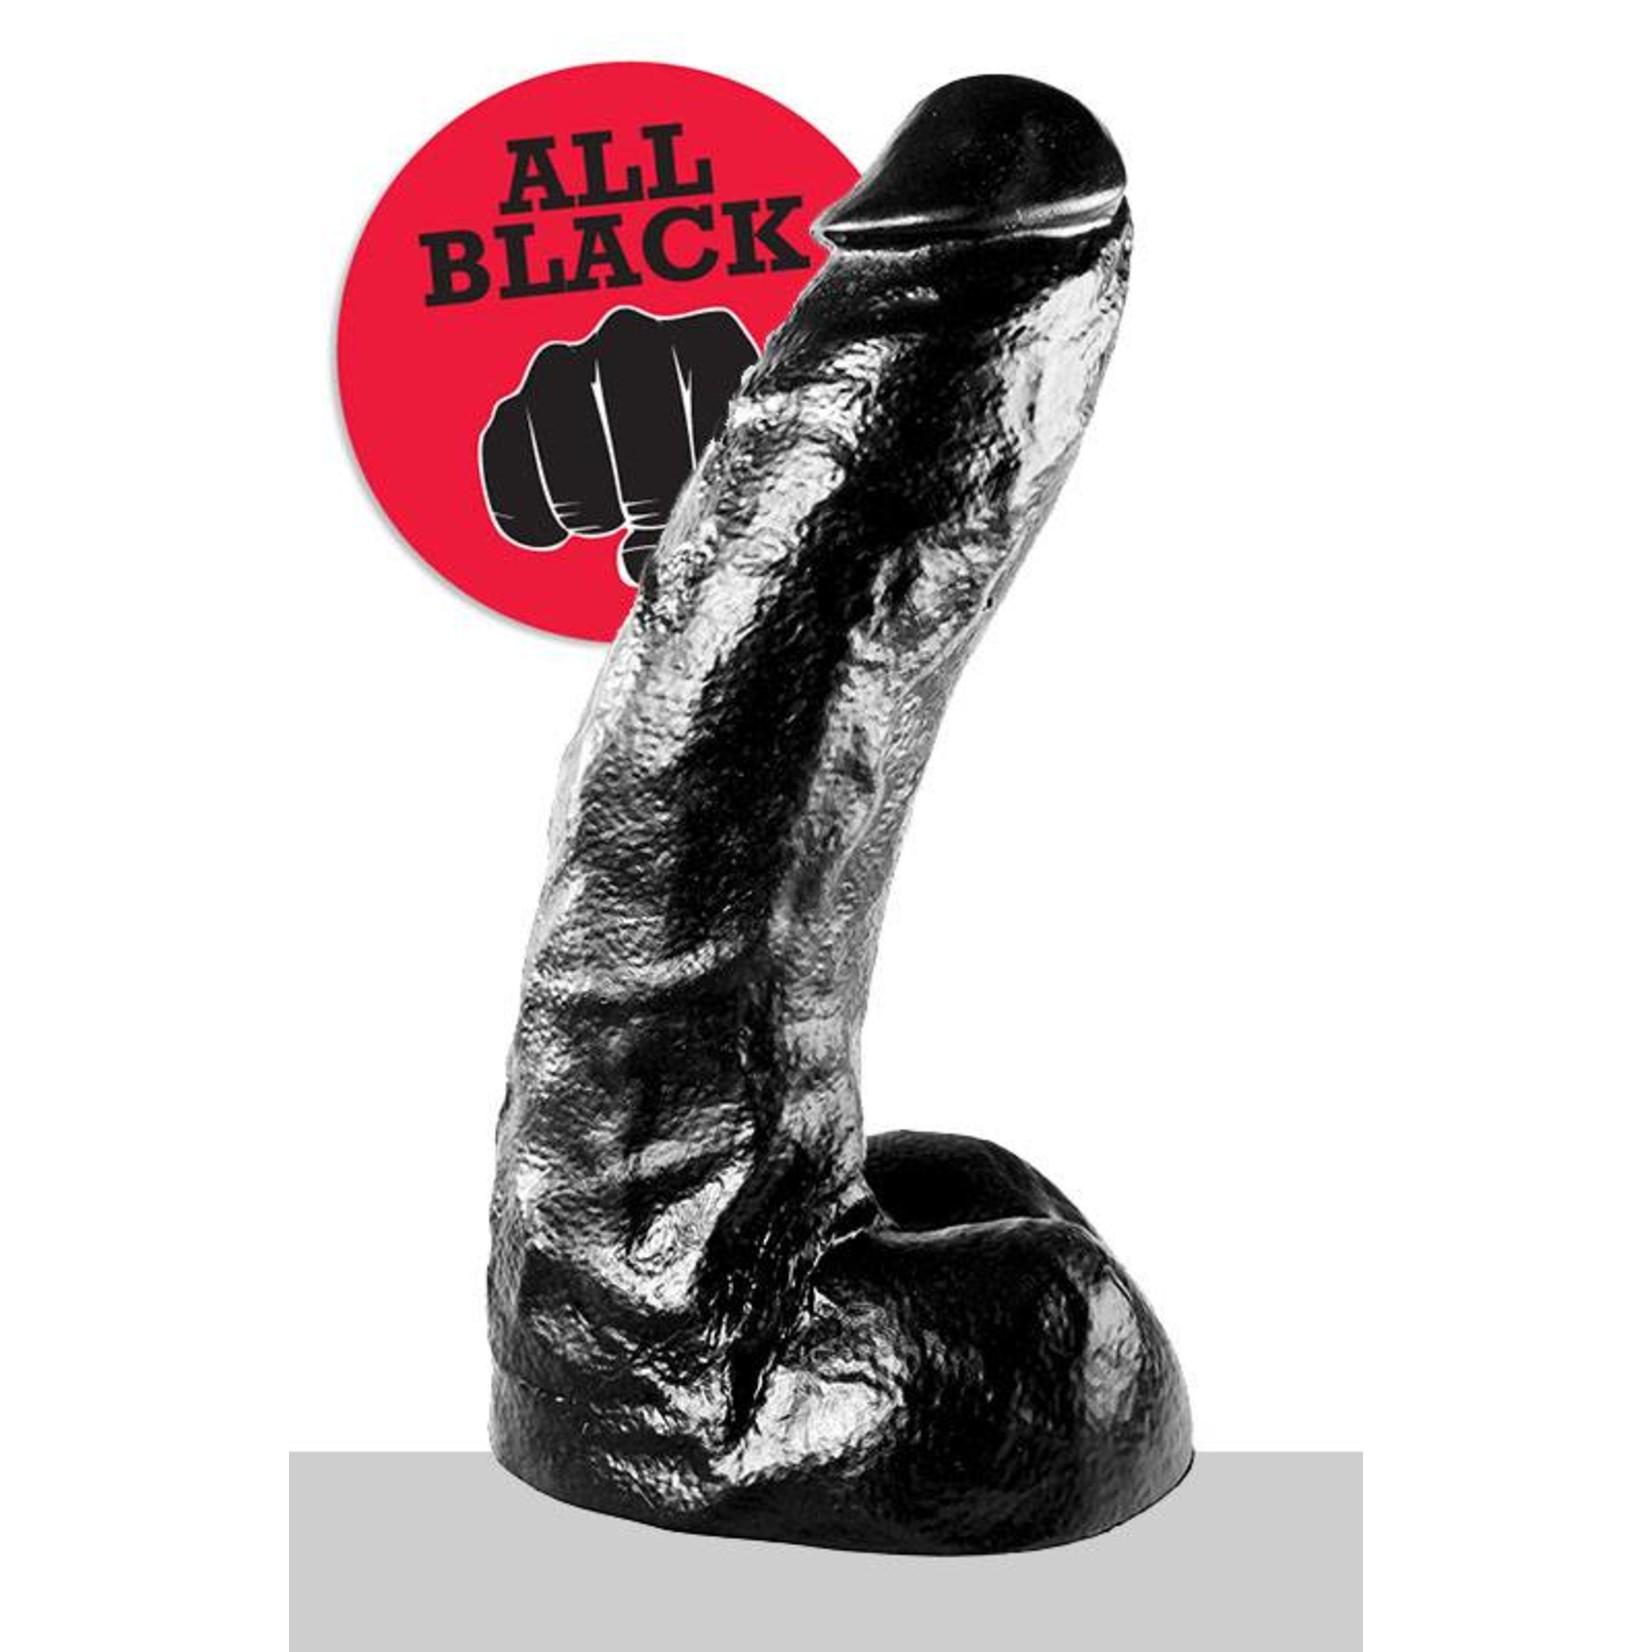 All Black All Black Dildo - AB 67